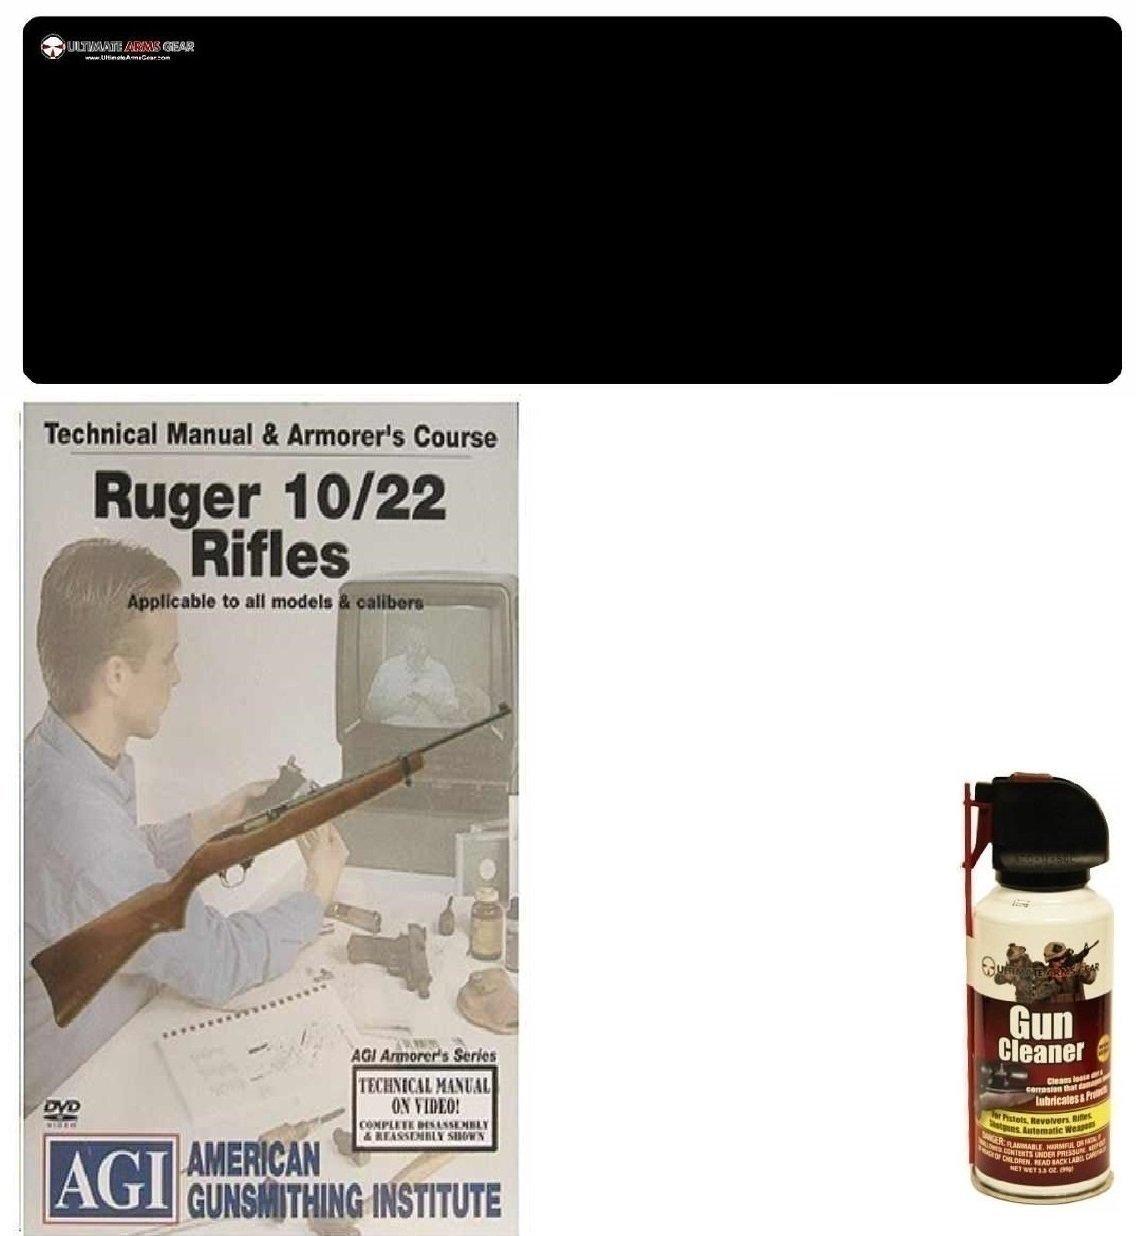 American Gunsmithing Institute DVD Manual & Armorer's Course Springfield M 1903 & '03 A3 Rifles Rifles + Ultimate Arms Gear Gunsmith & Armorer's Cleaning Bench Gun Mat